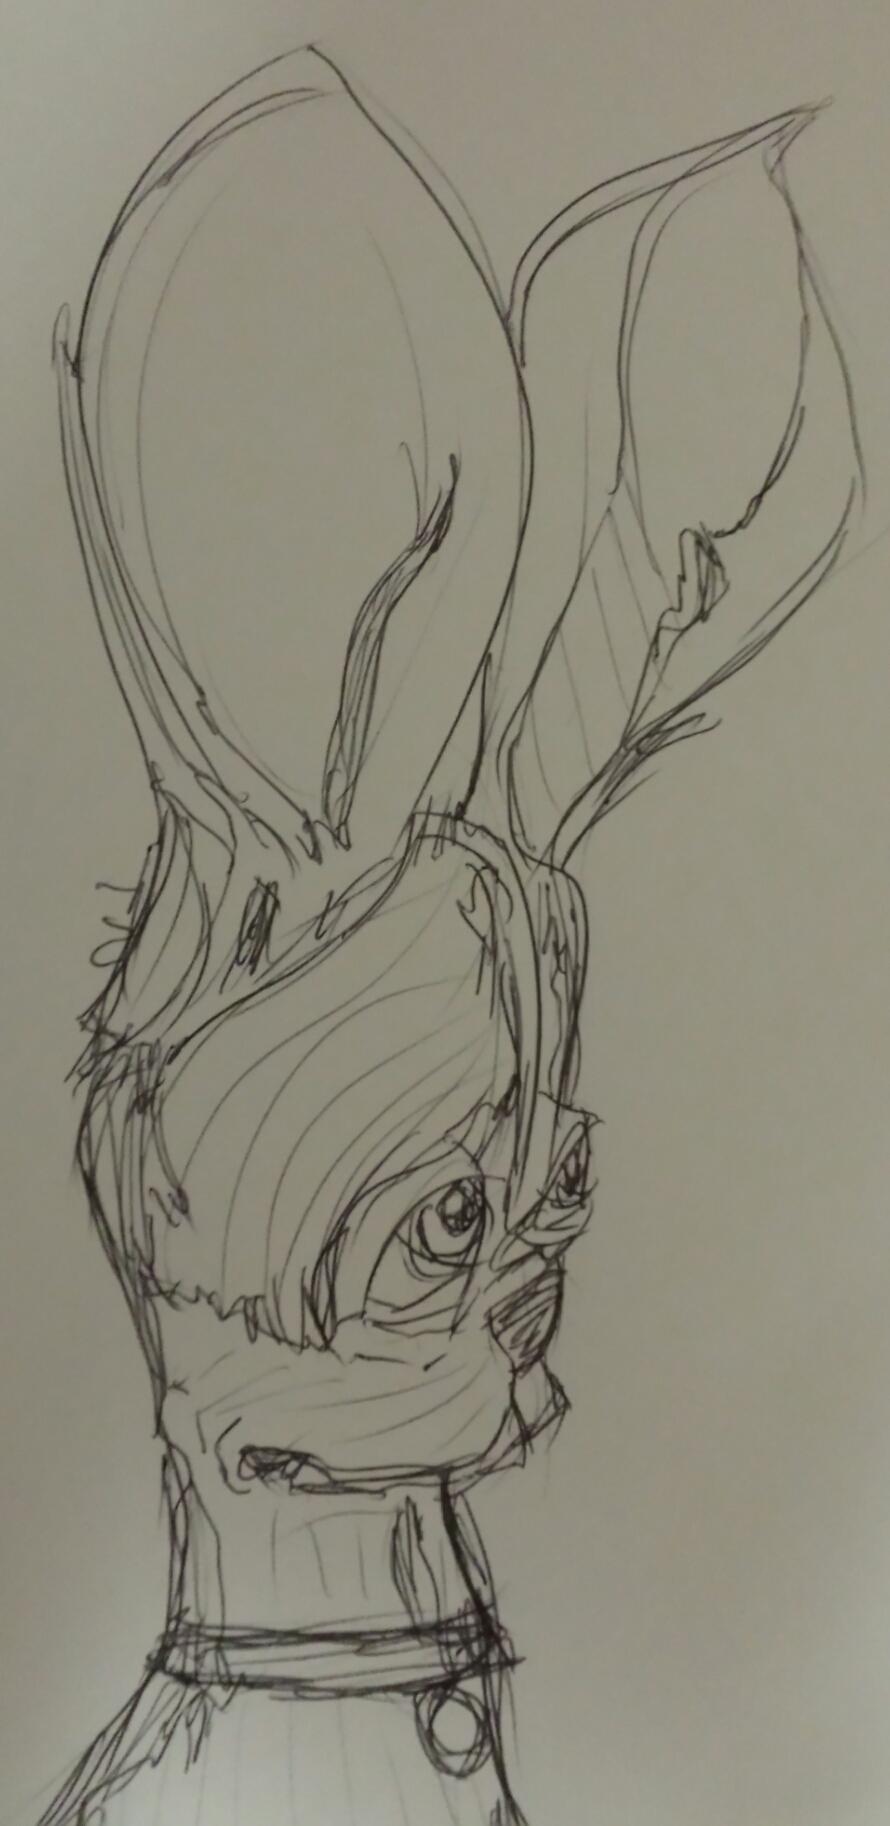 Dog with big ears 2